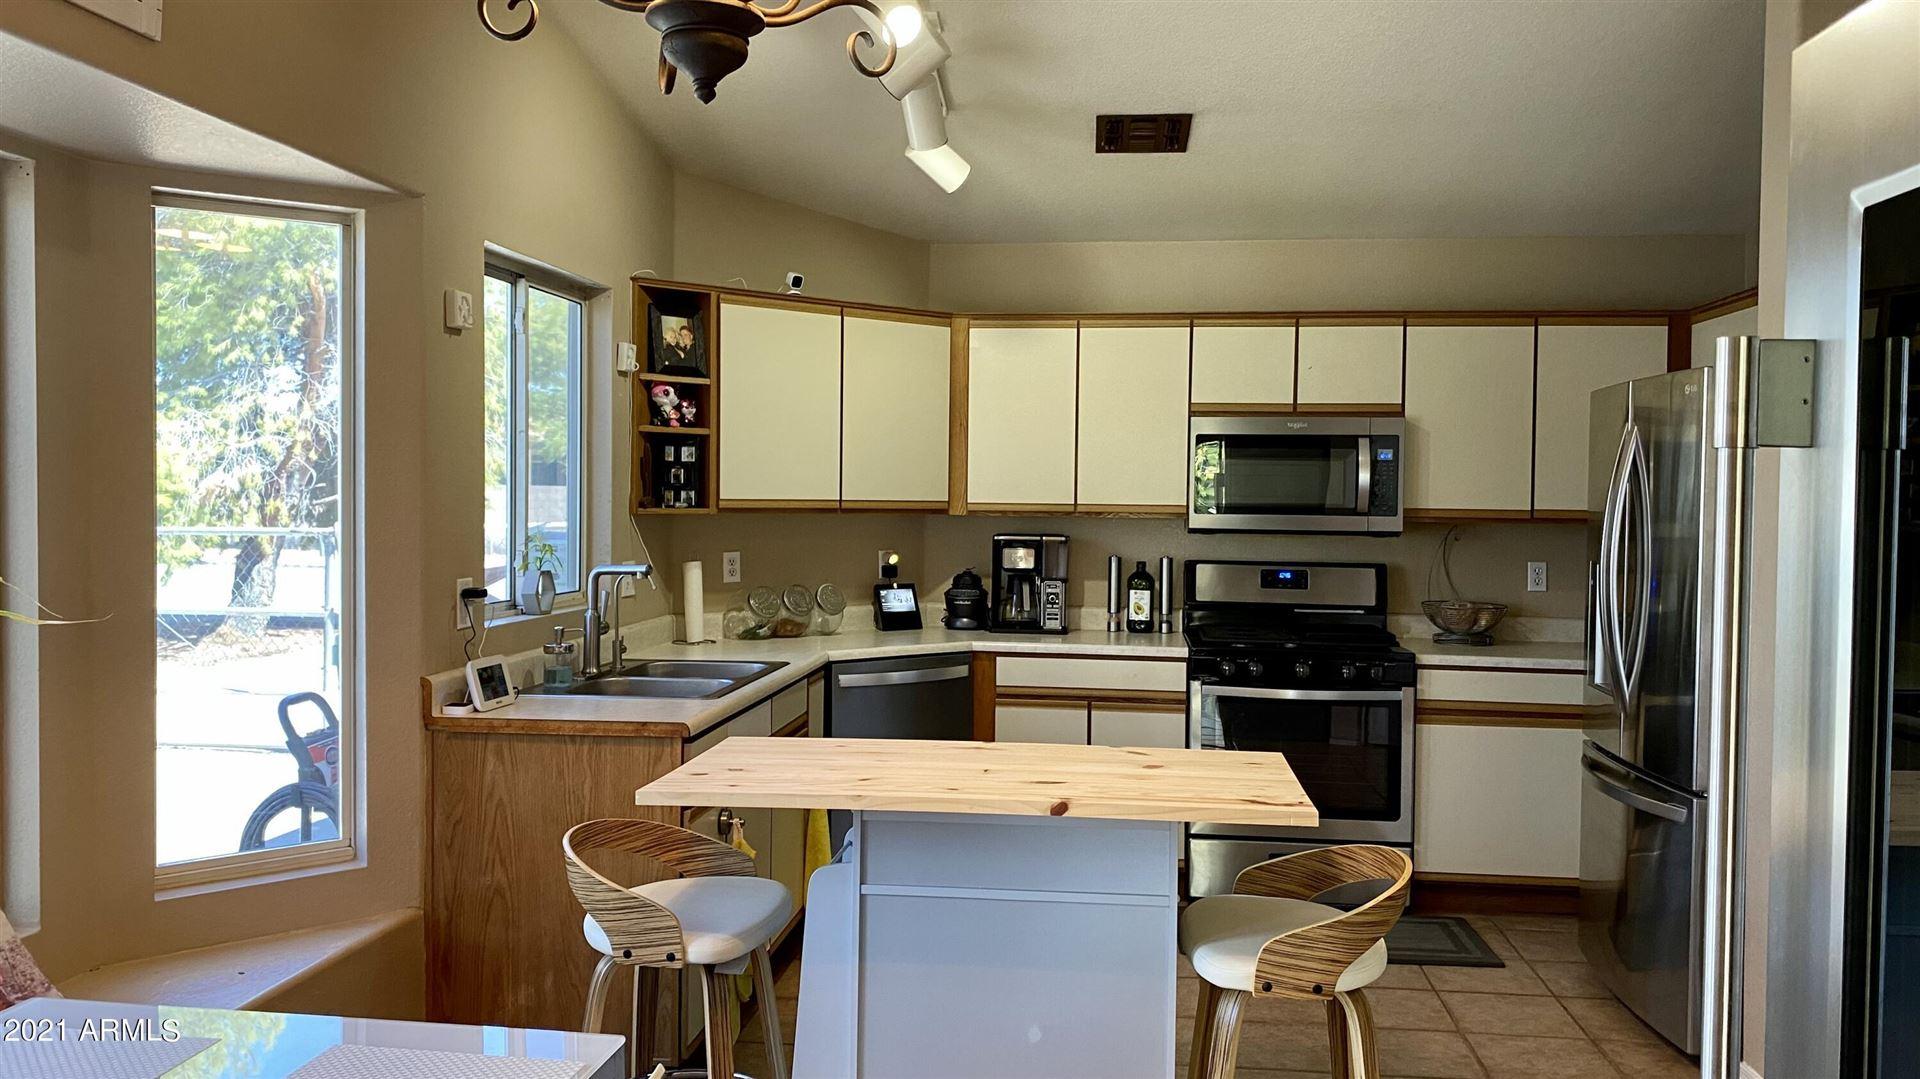 Photo of 312 N James Sherwood Street, Tolleson, AZ 85353 (MLS # 6301202)